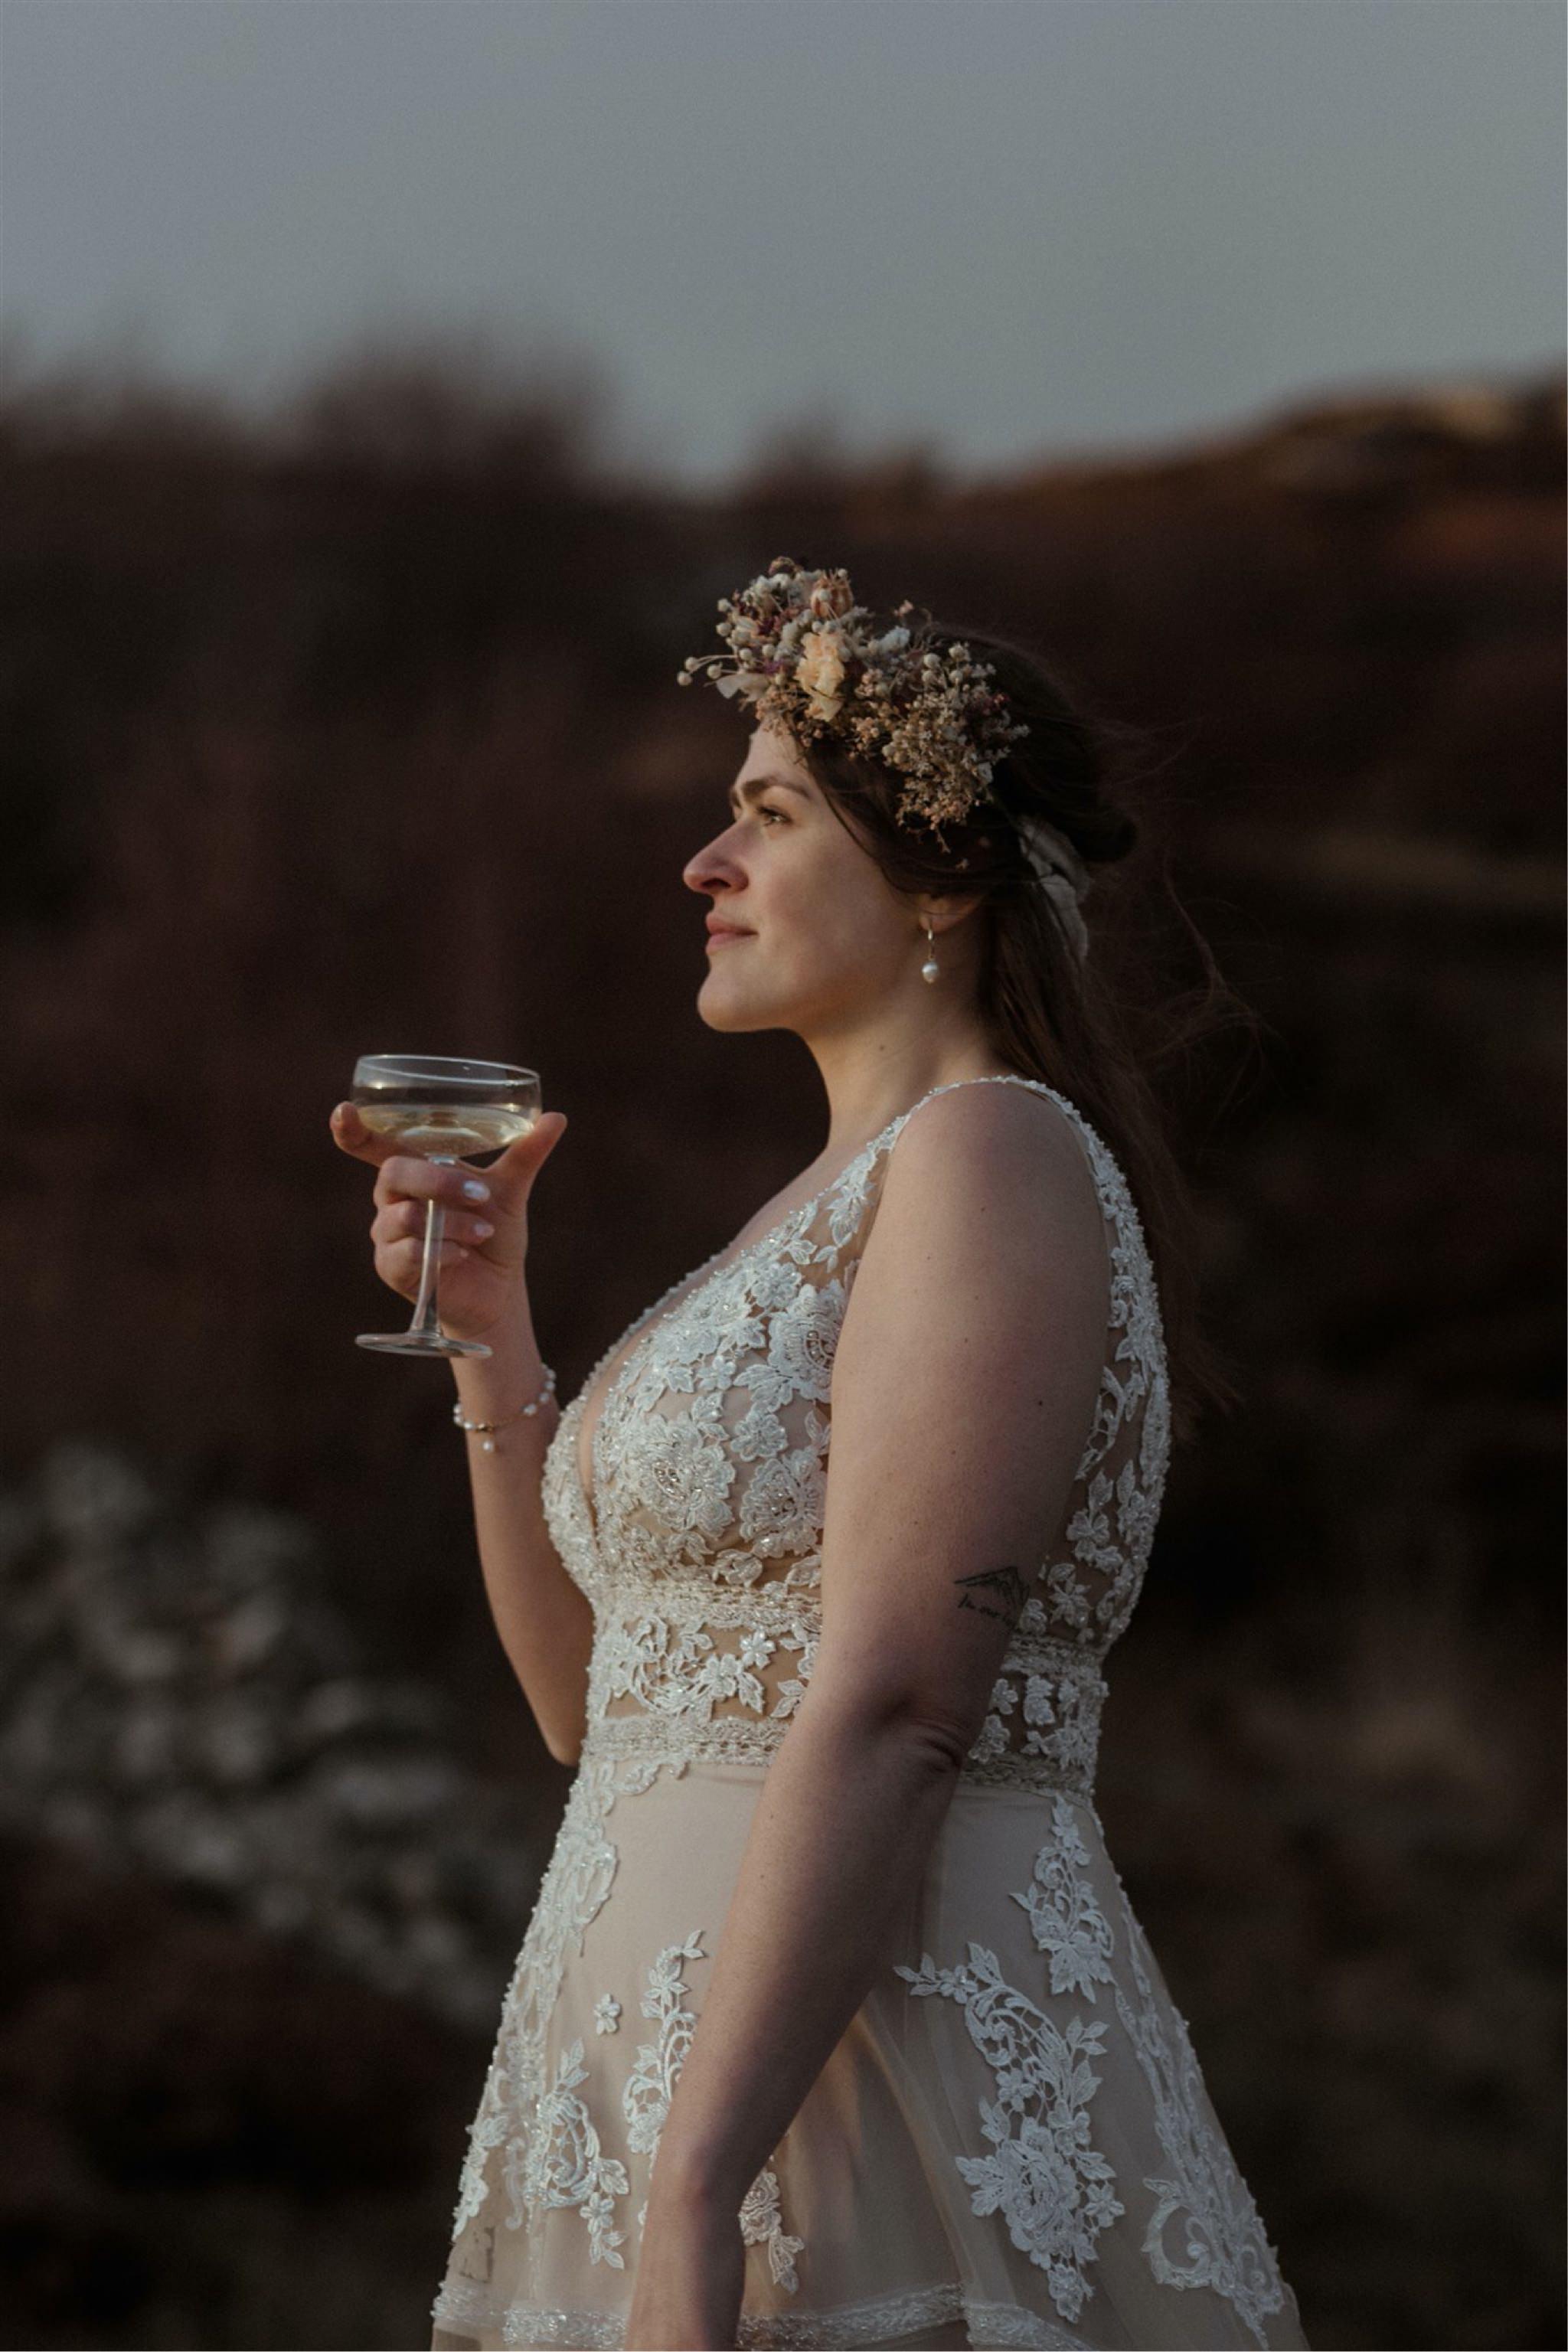 Bride drinking Champagne after a Scotland elopement wedding